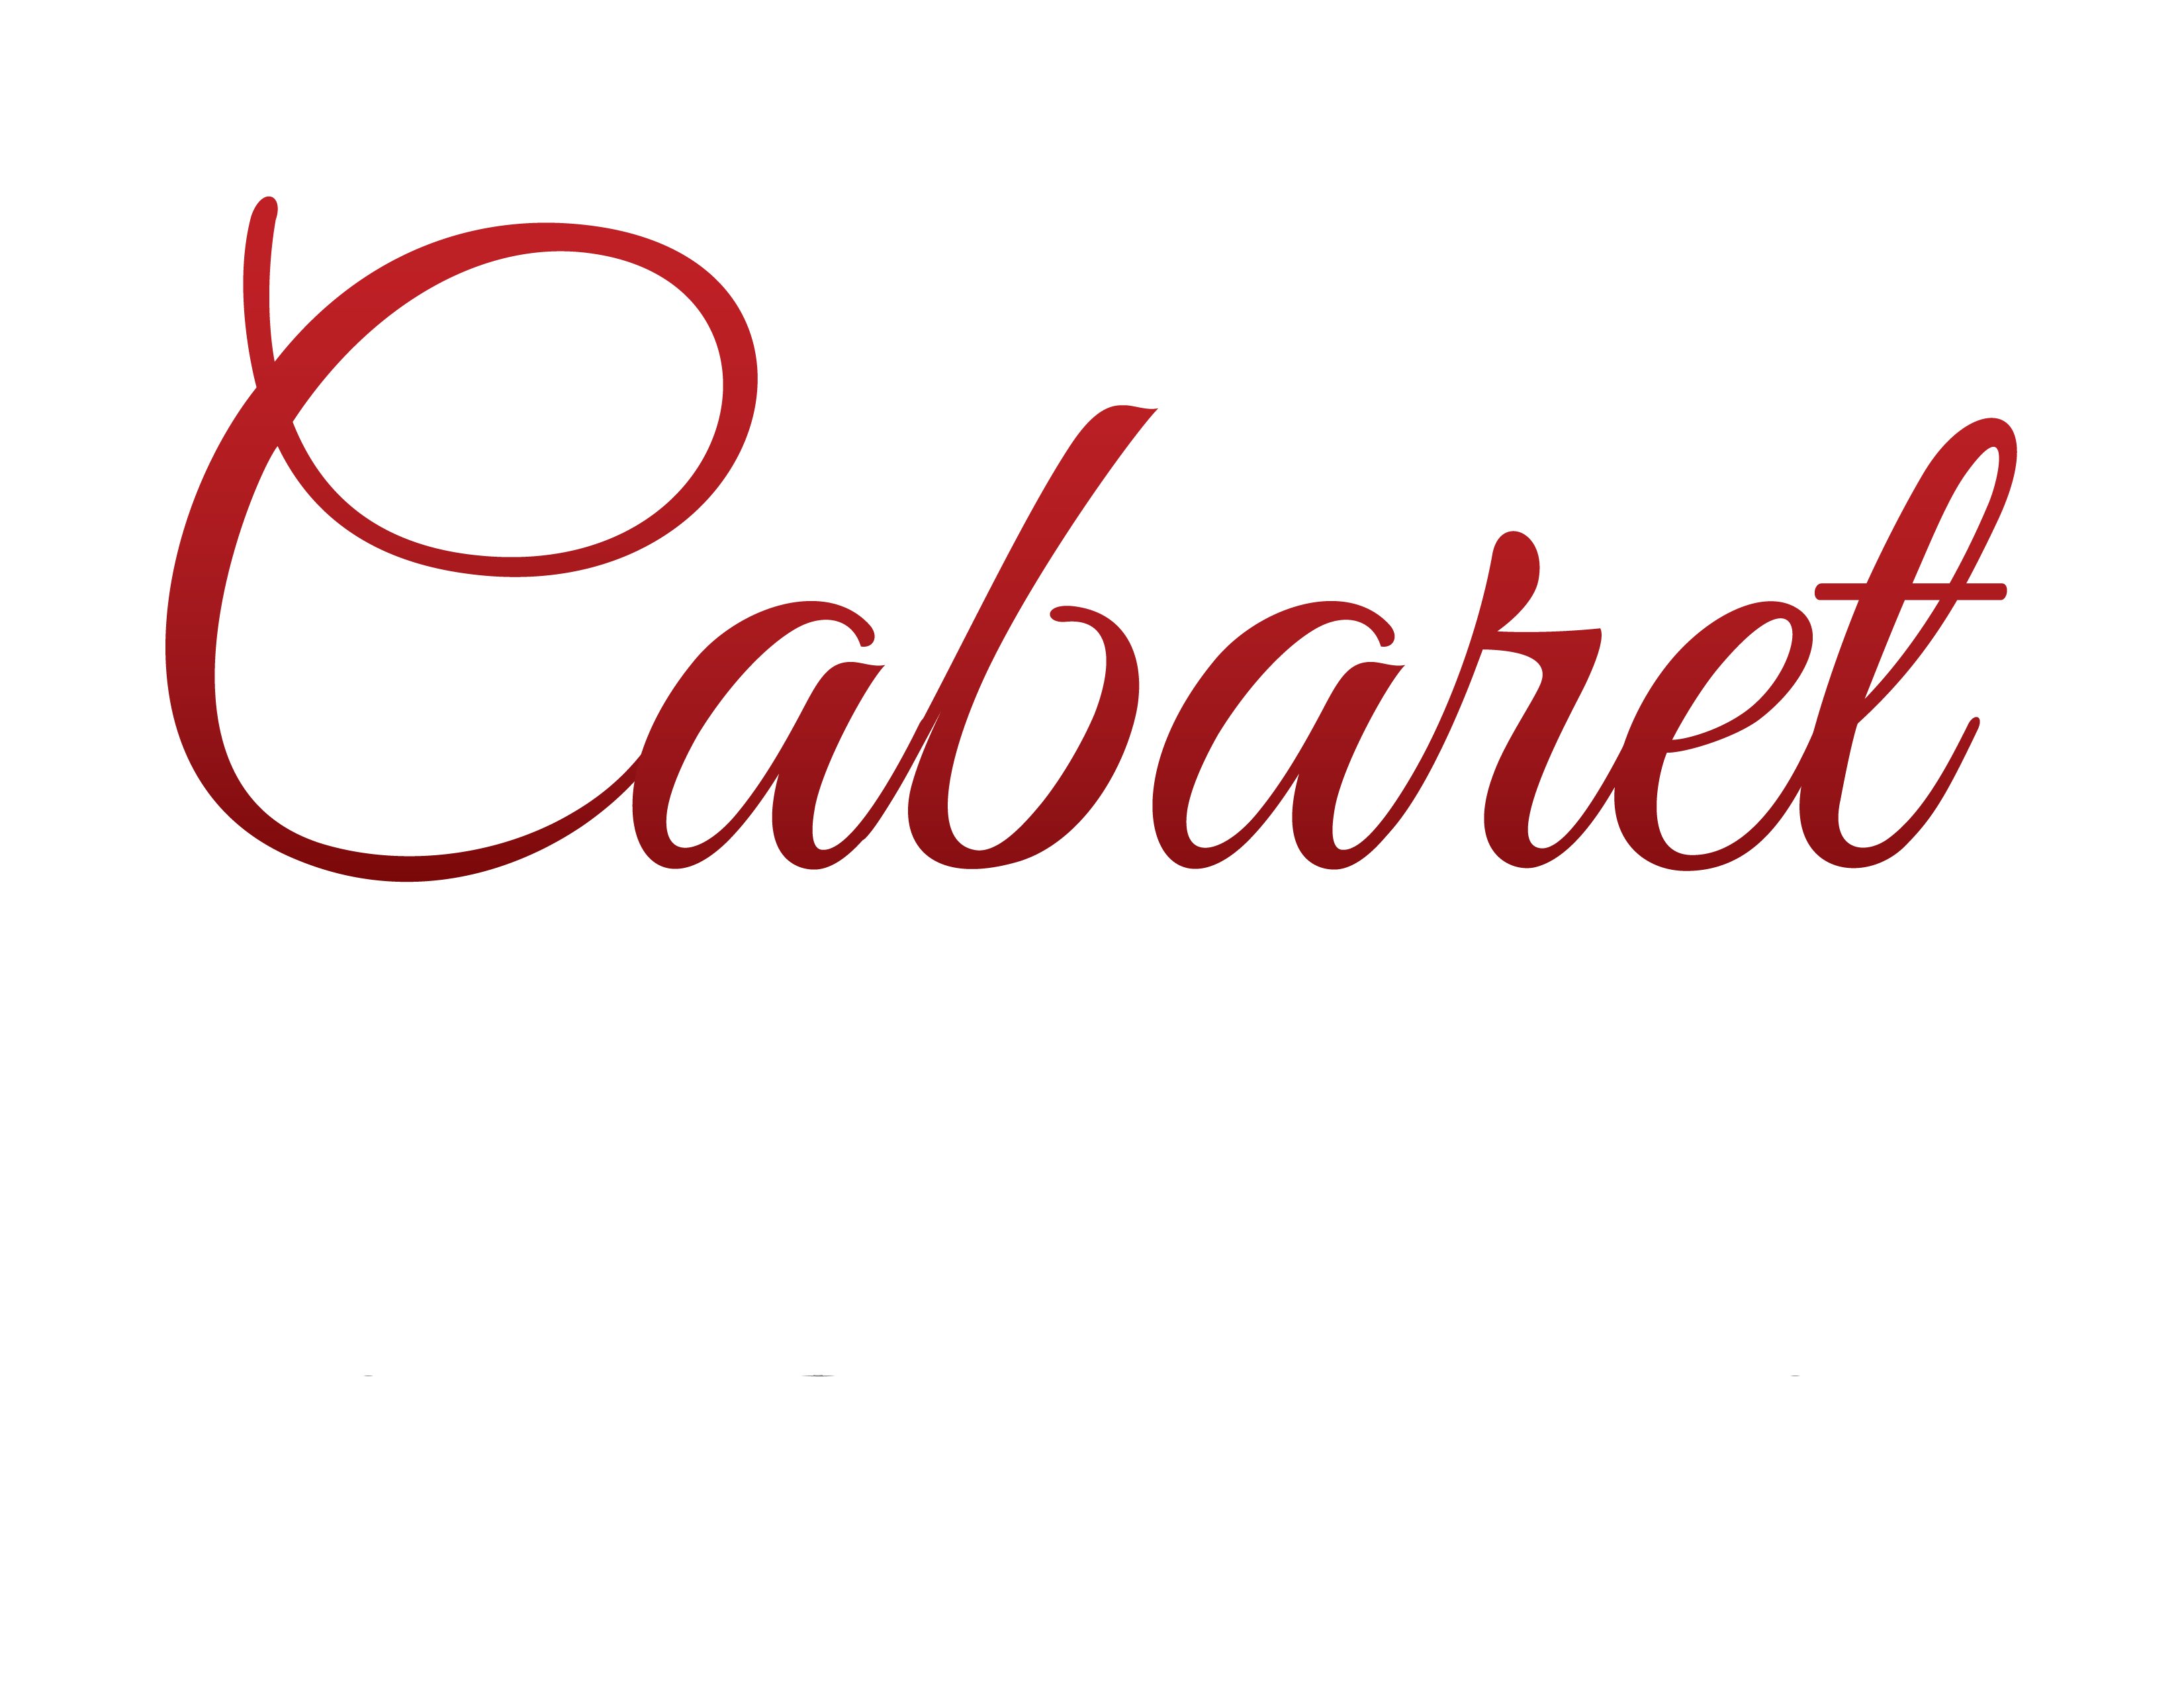 Cabaret hair esthetics. Eyelashes clipart esthetician